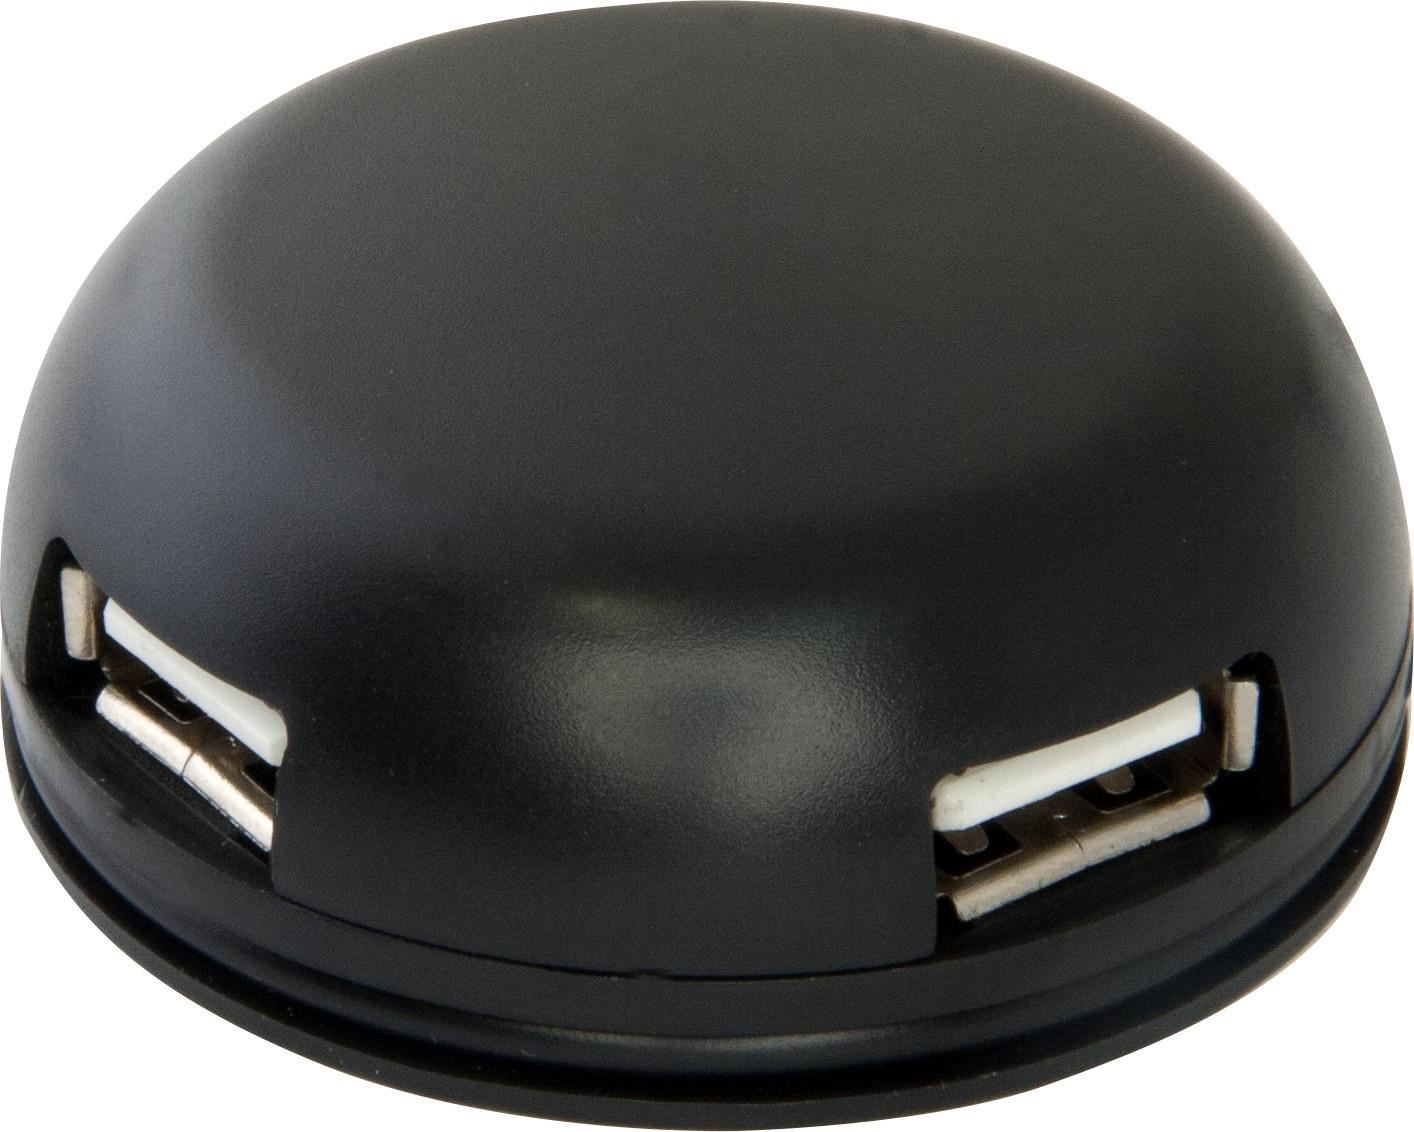 USB-разветвитель Defender Quadro Light USB 2.0, 83201, 4 порта